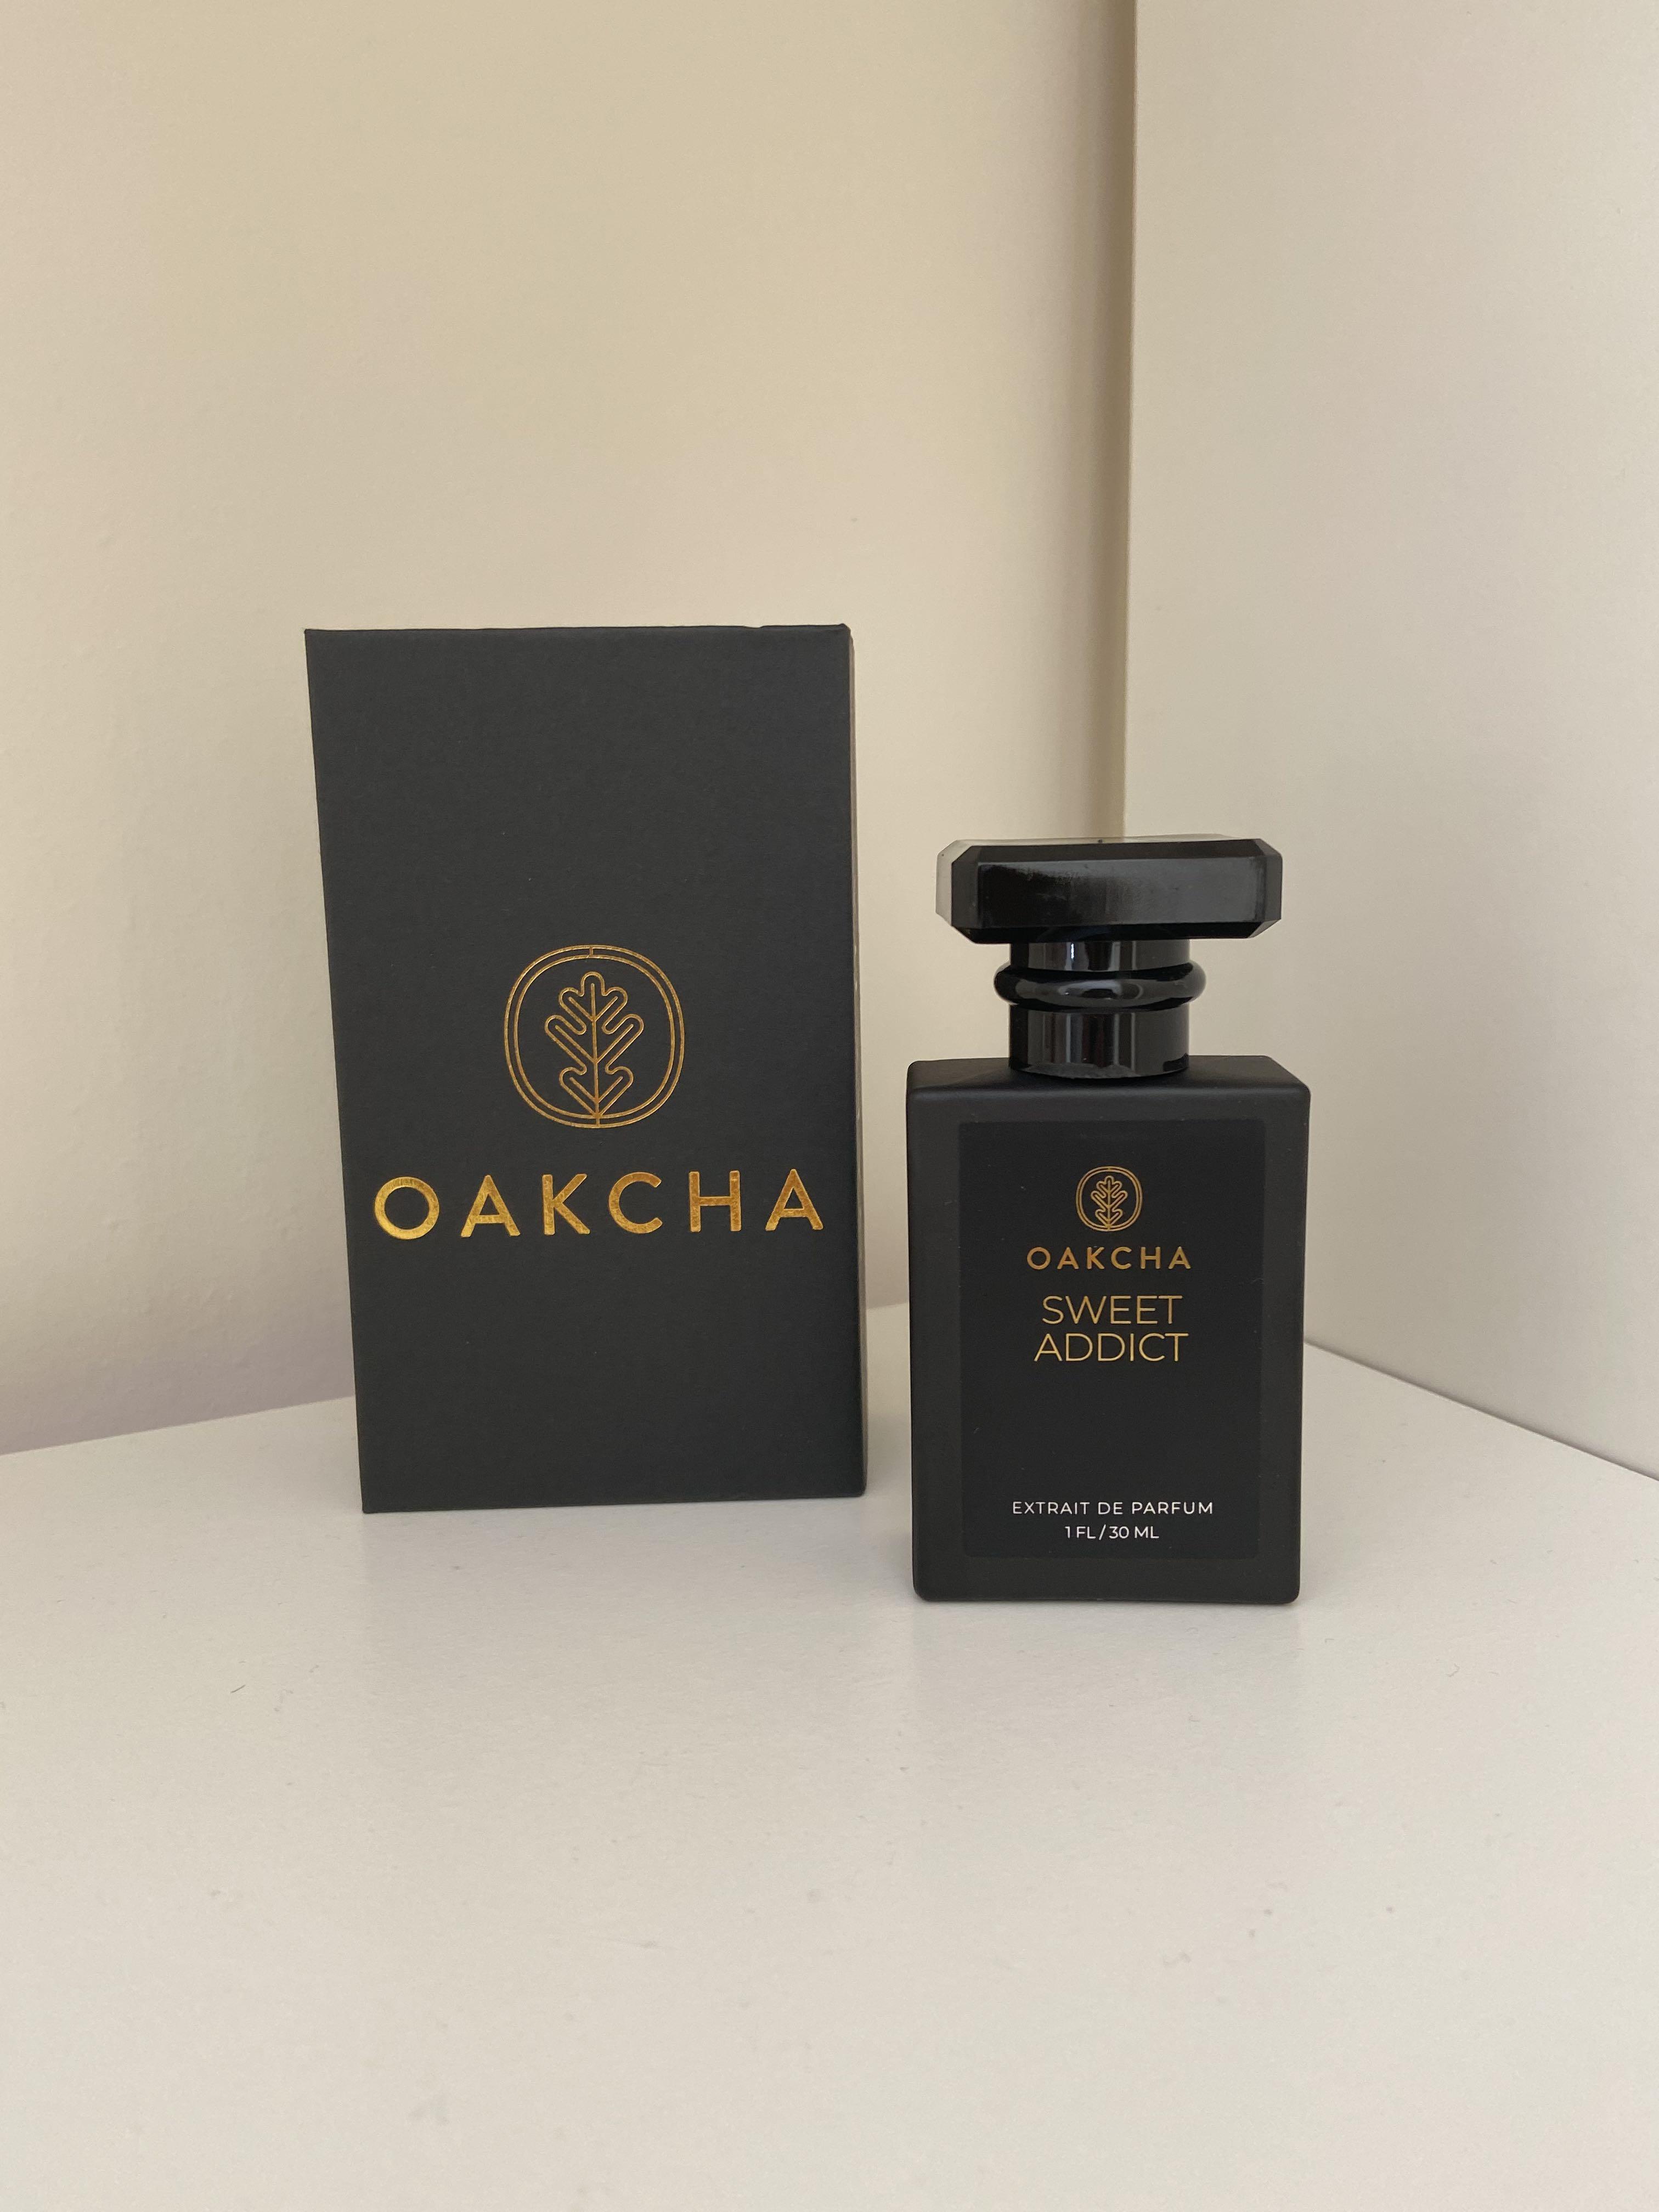 Oakcha - sweet addict